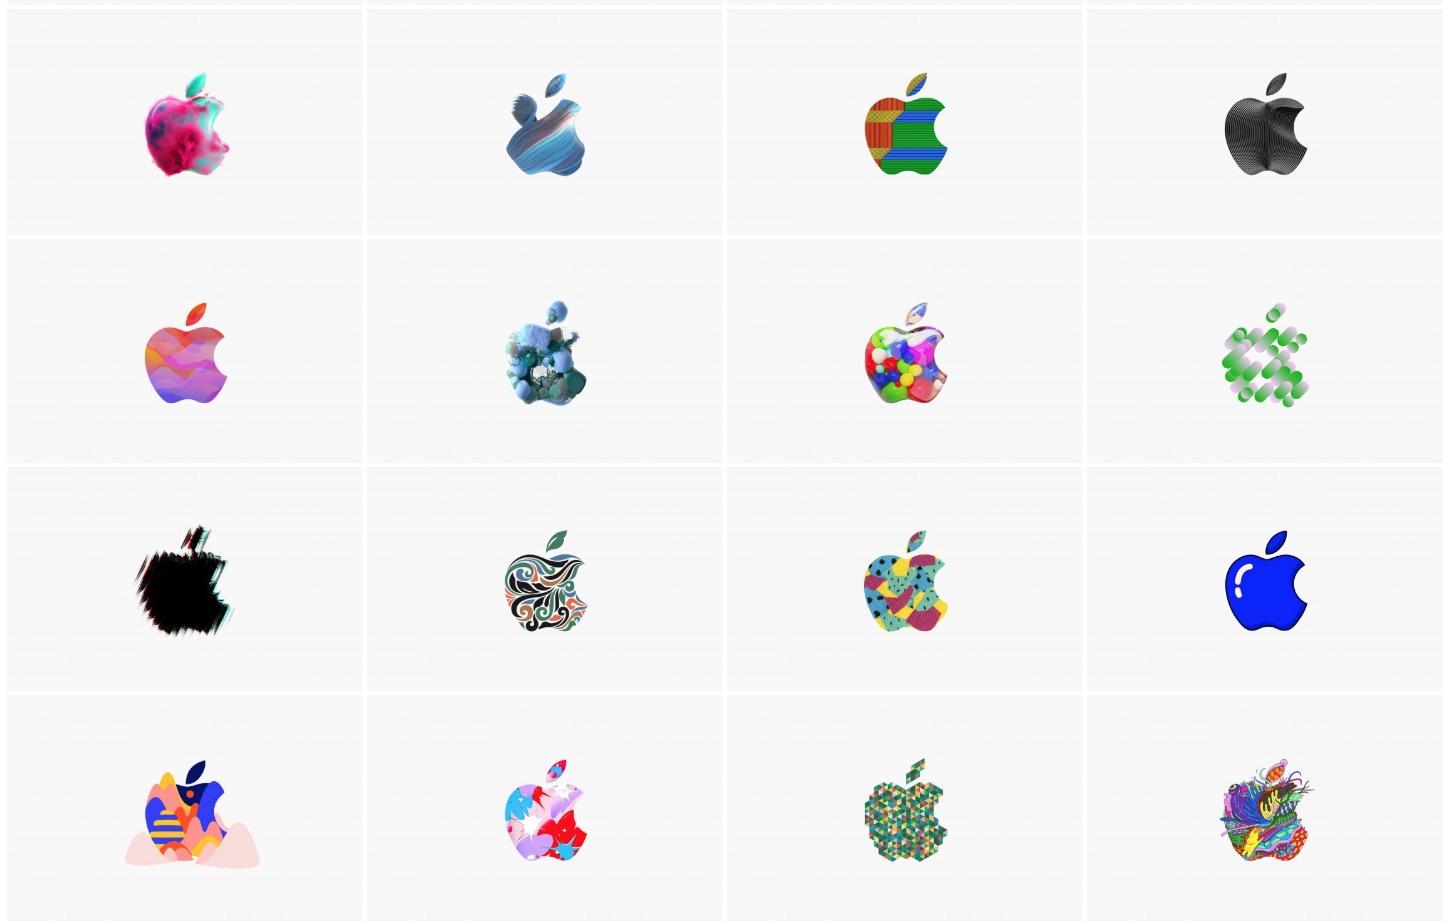 Appleイベントの壁紙が全種類が公開 Iphone Ipad Mac用 私設apple委員会